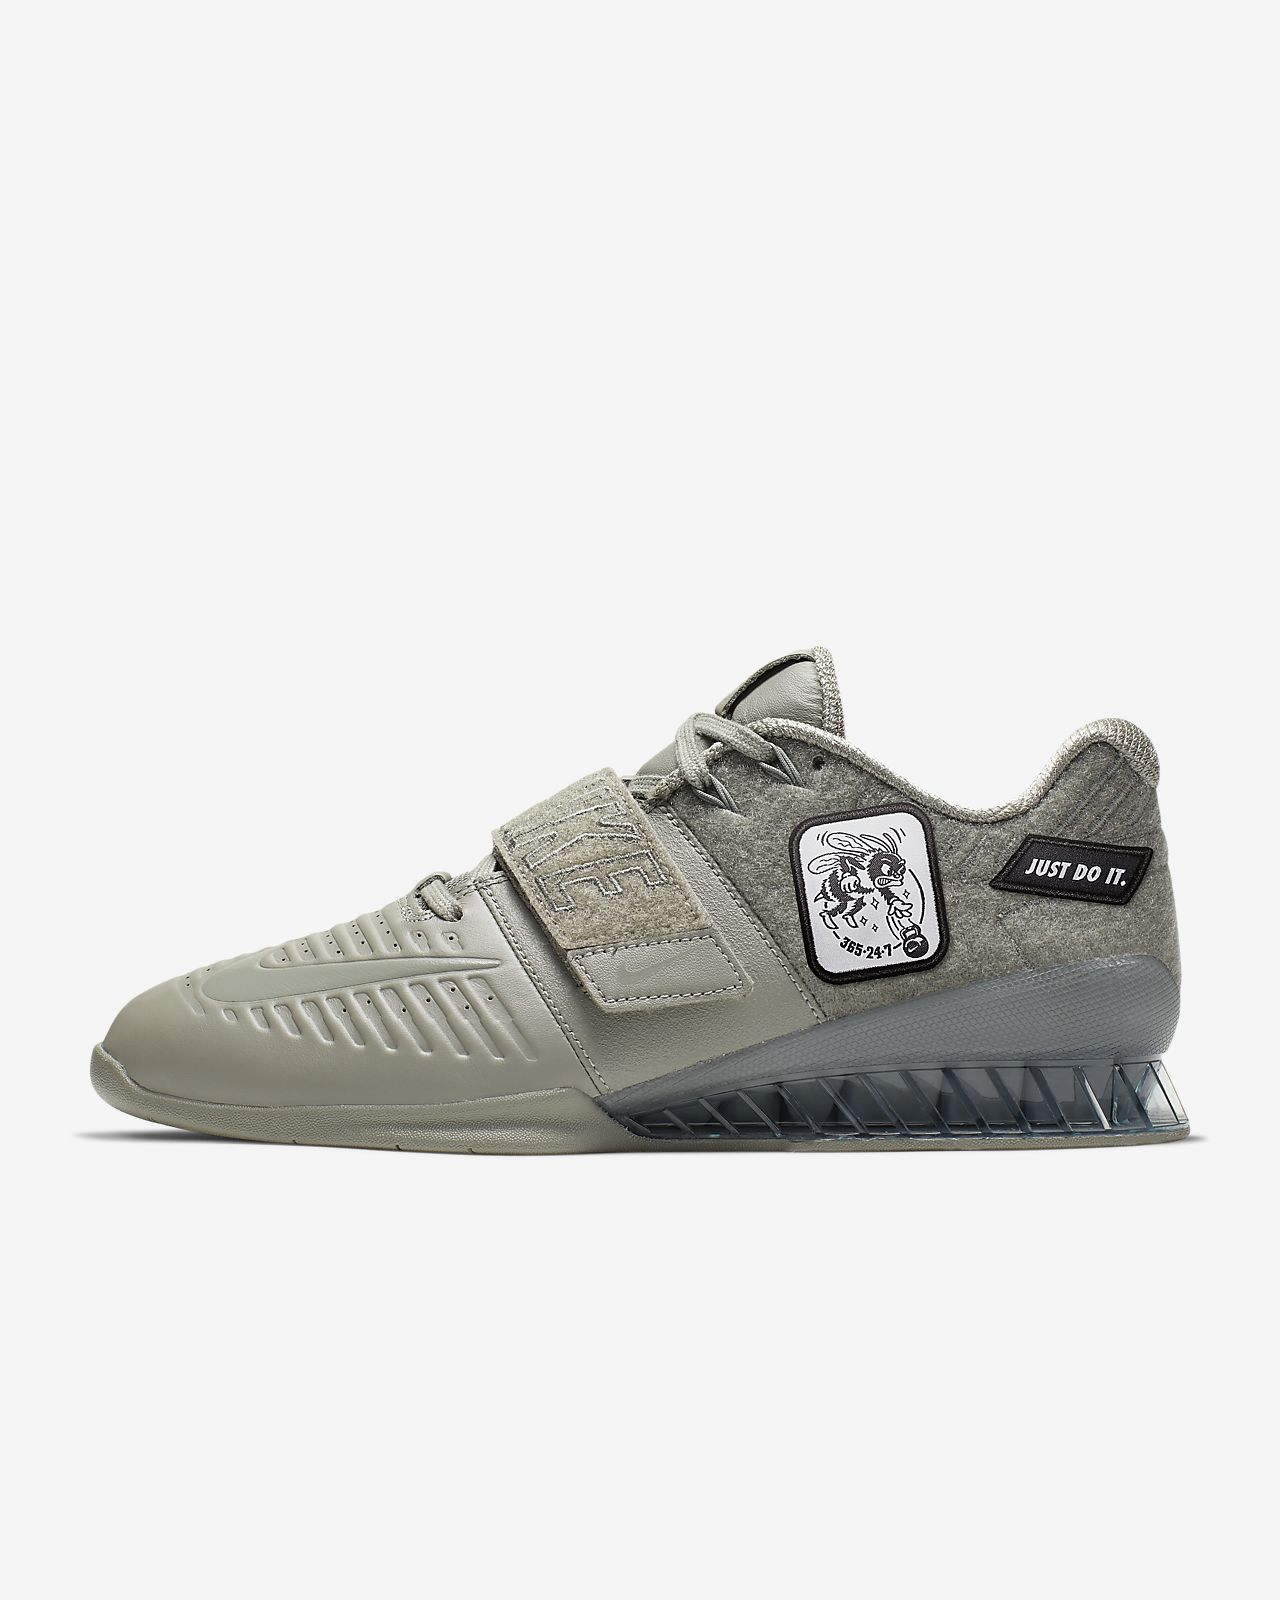 Chaussure de training Nike Romaleos 3 XD Patch